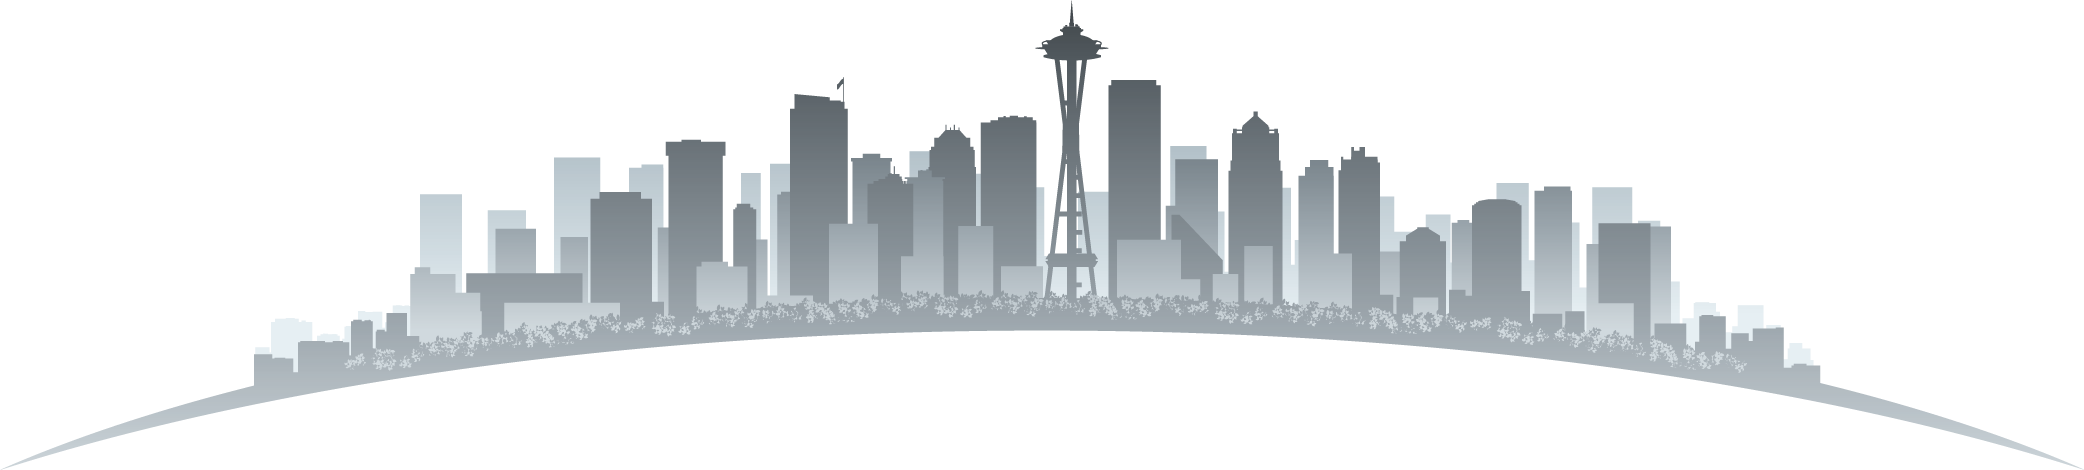 Test America - Seattle, Washington